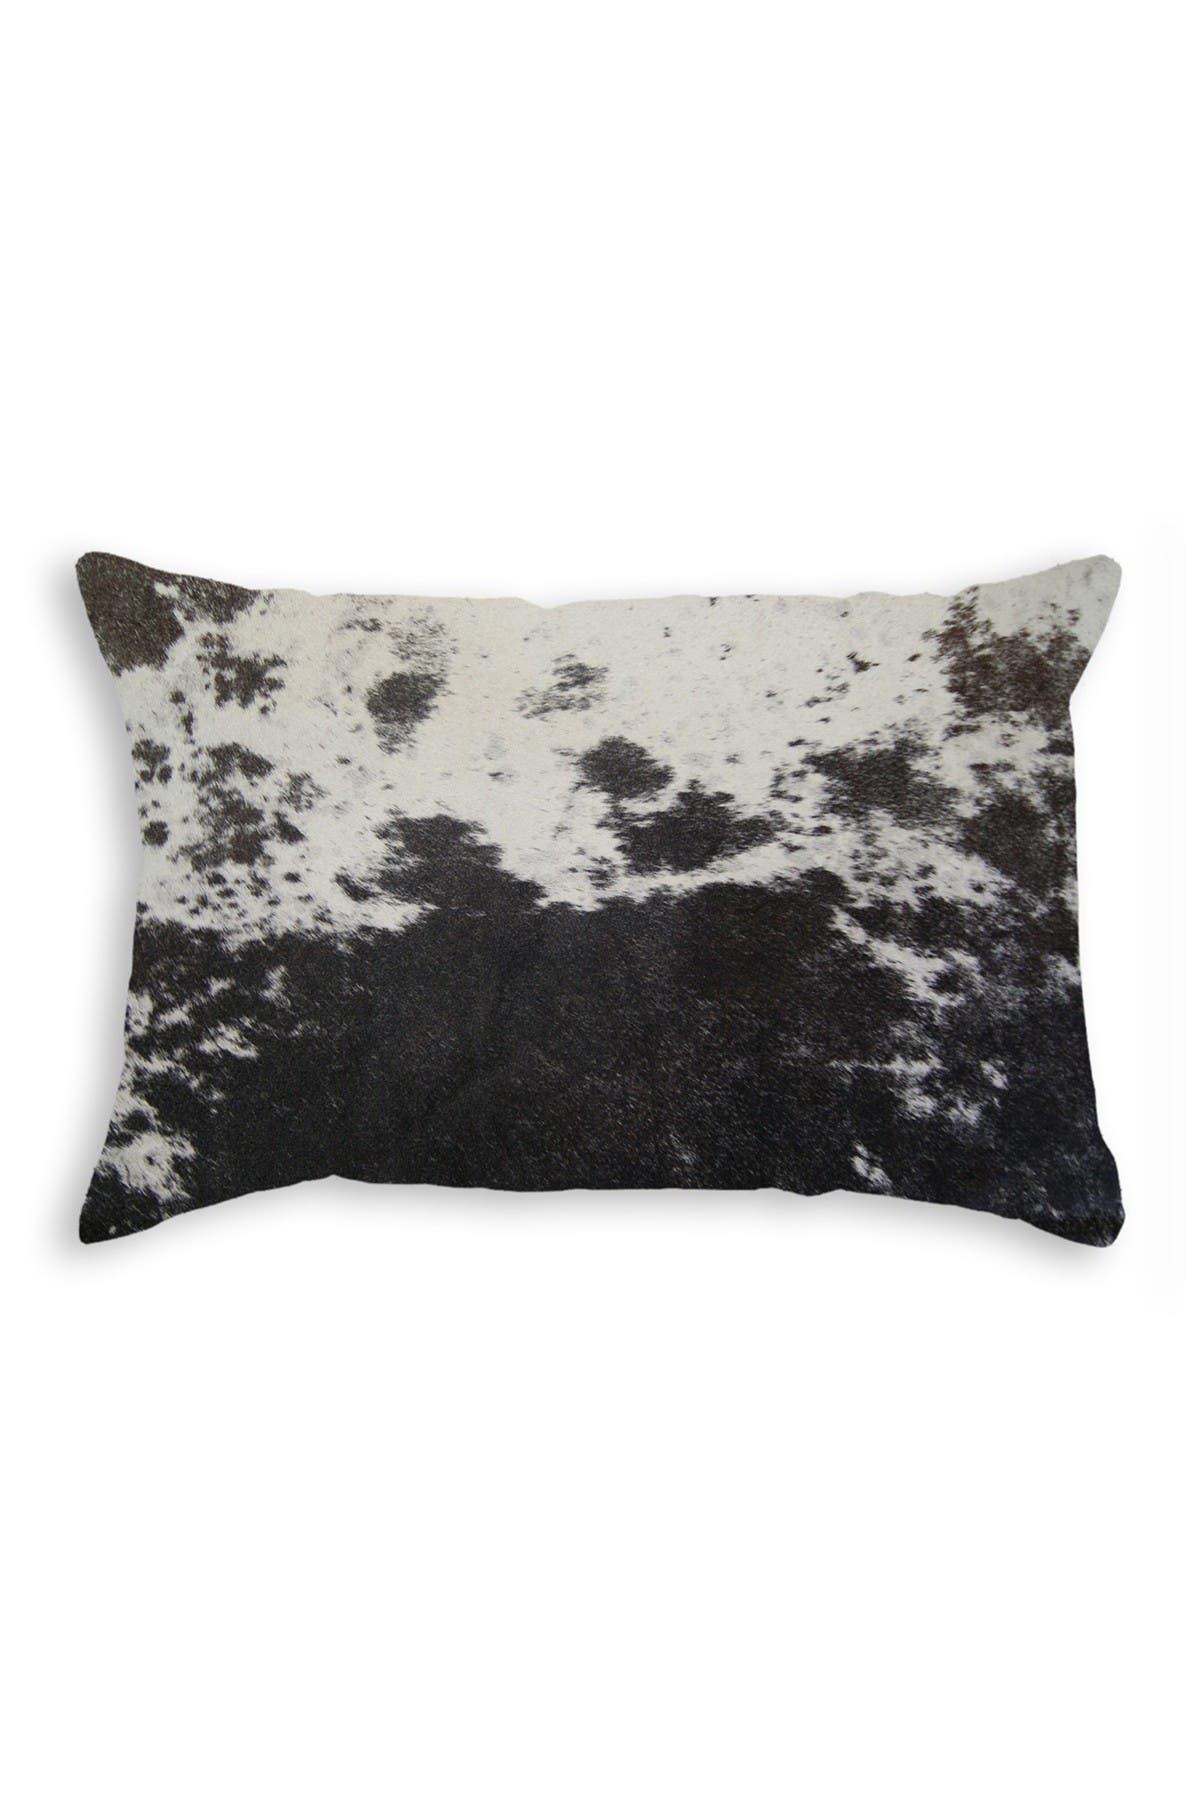 "Image of Natural Torino Genuine Cowhide Pillow - 12""x20"" - Black/White"